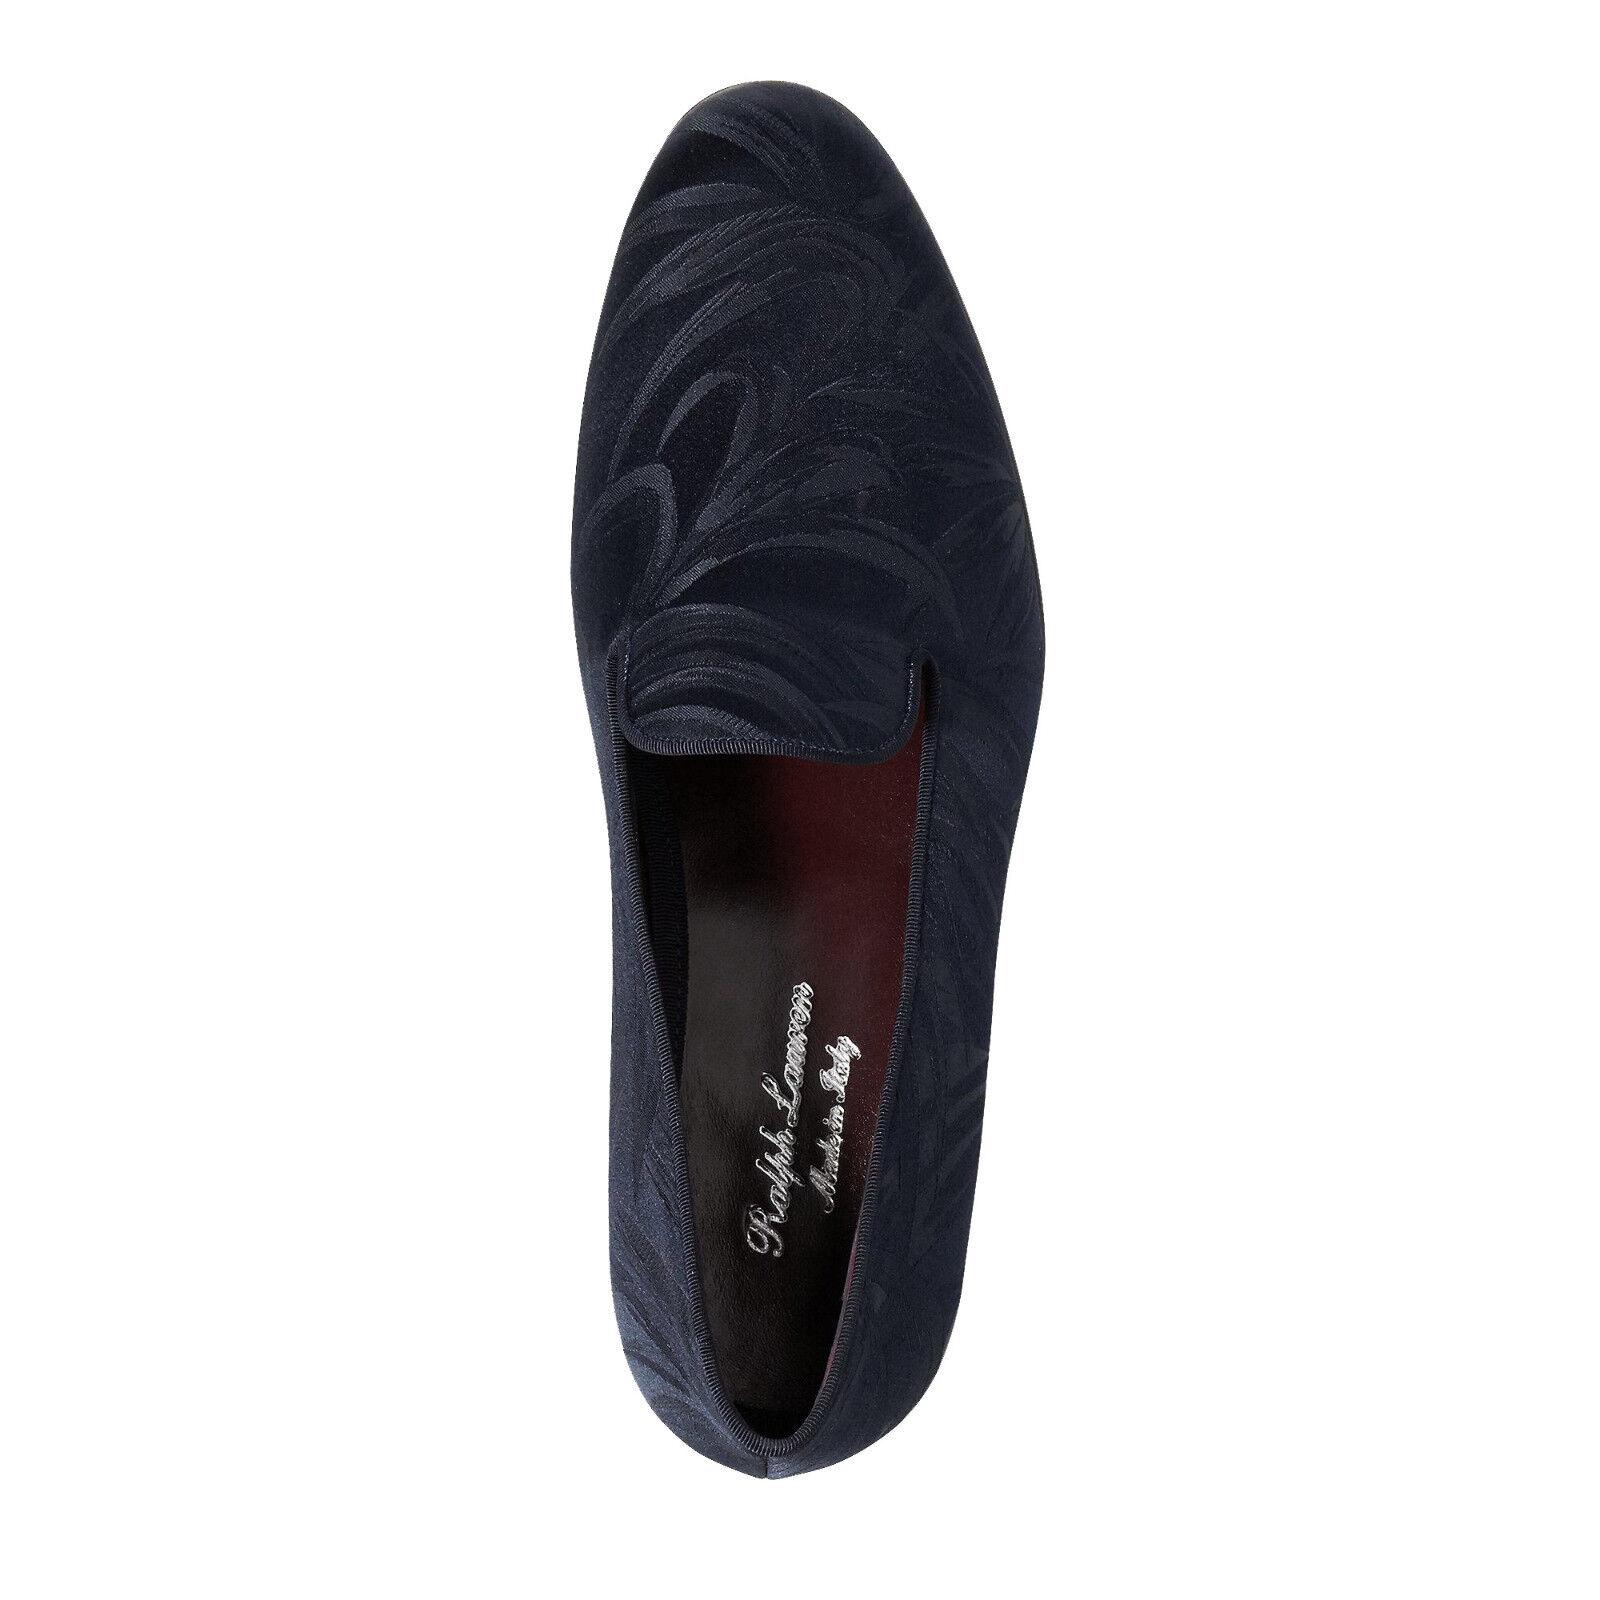 Ralph Lauren lila Label Marineblau Collis Palm Jacquard Slipper Slipper Slipper Schuhe Neu  610f10